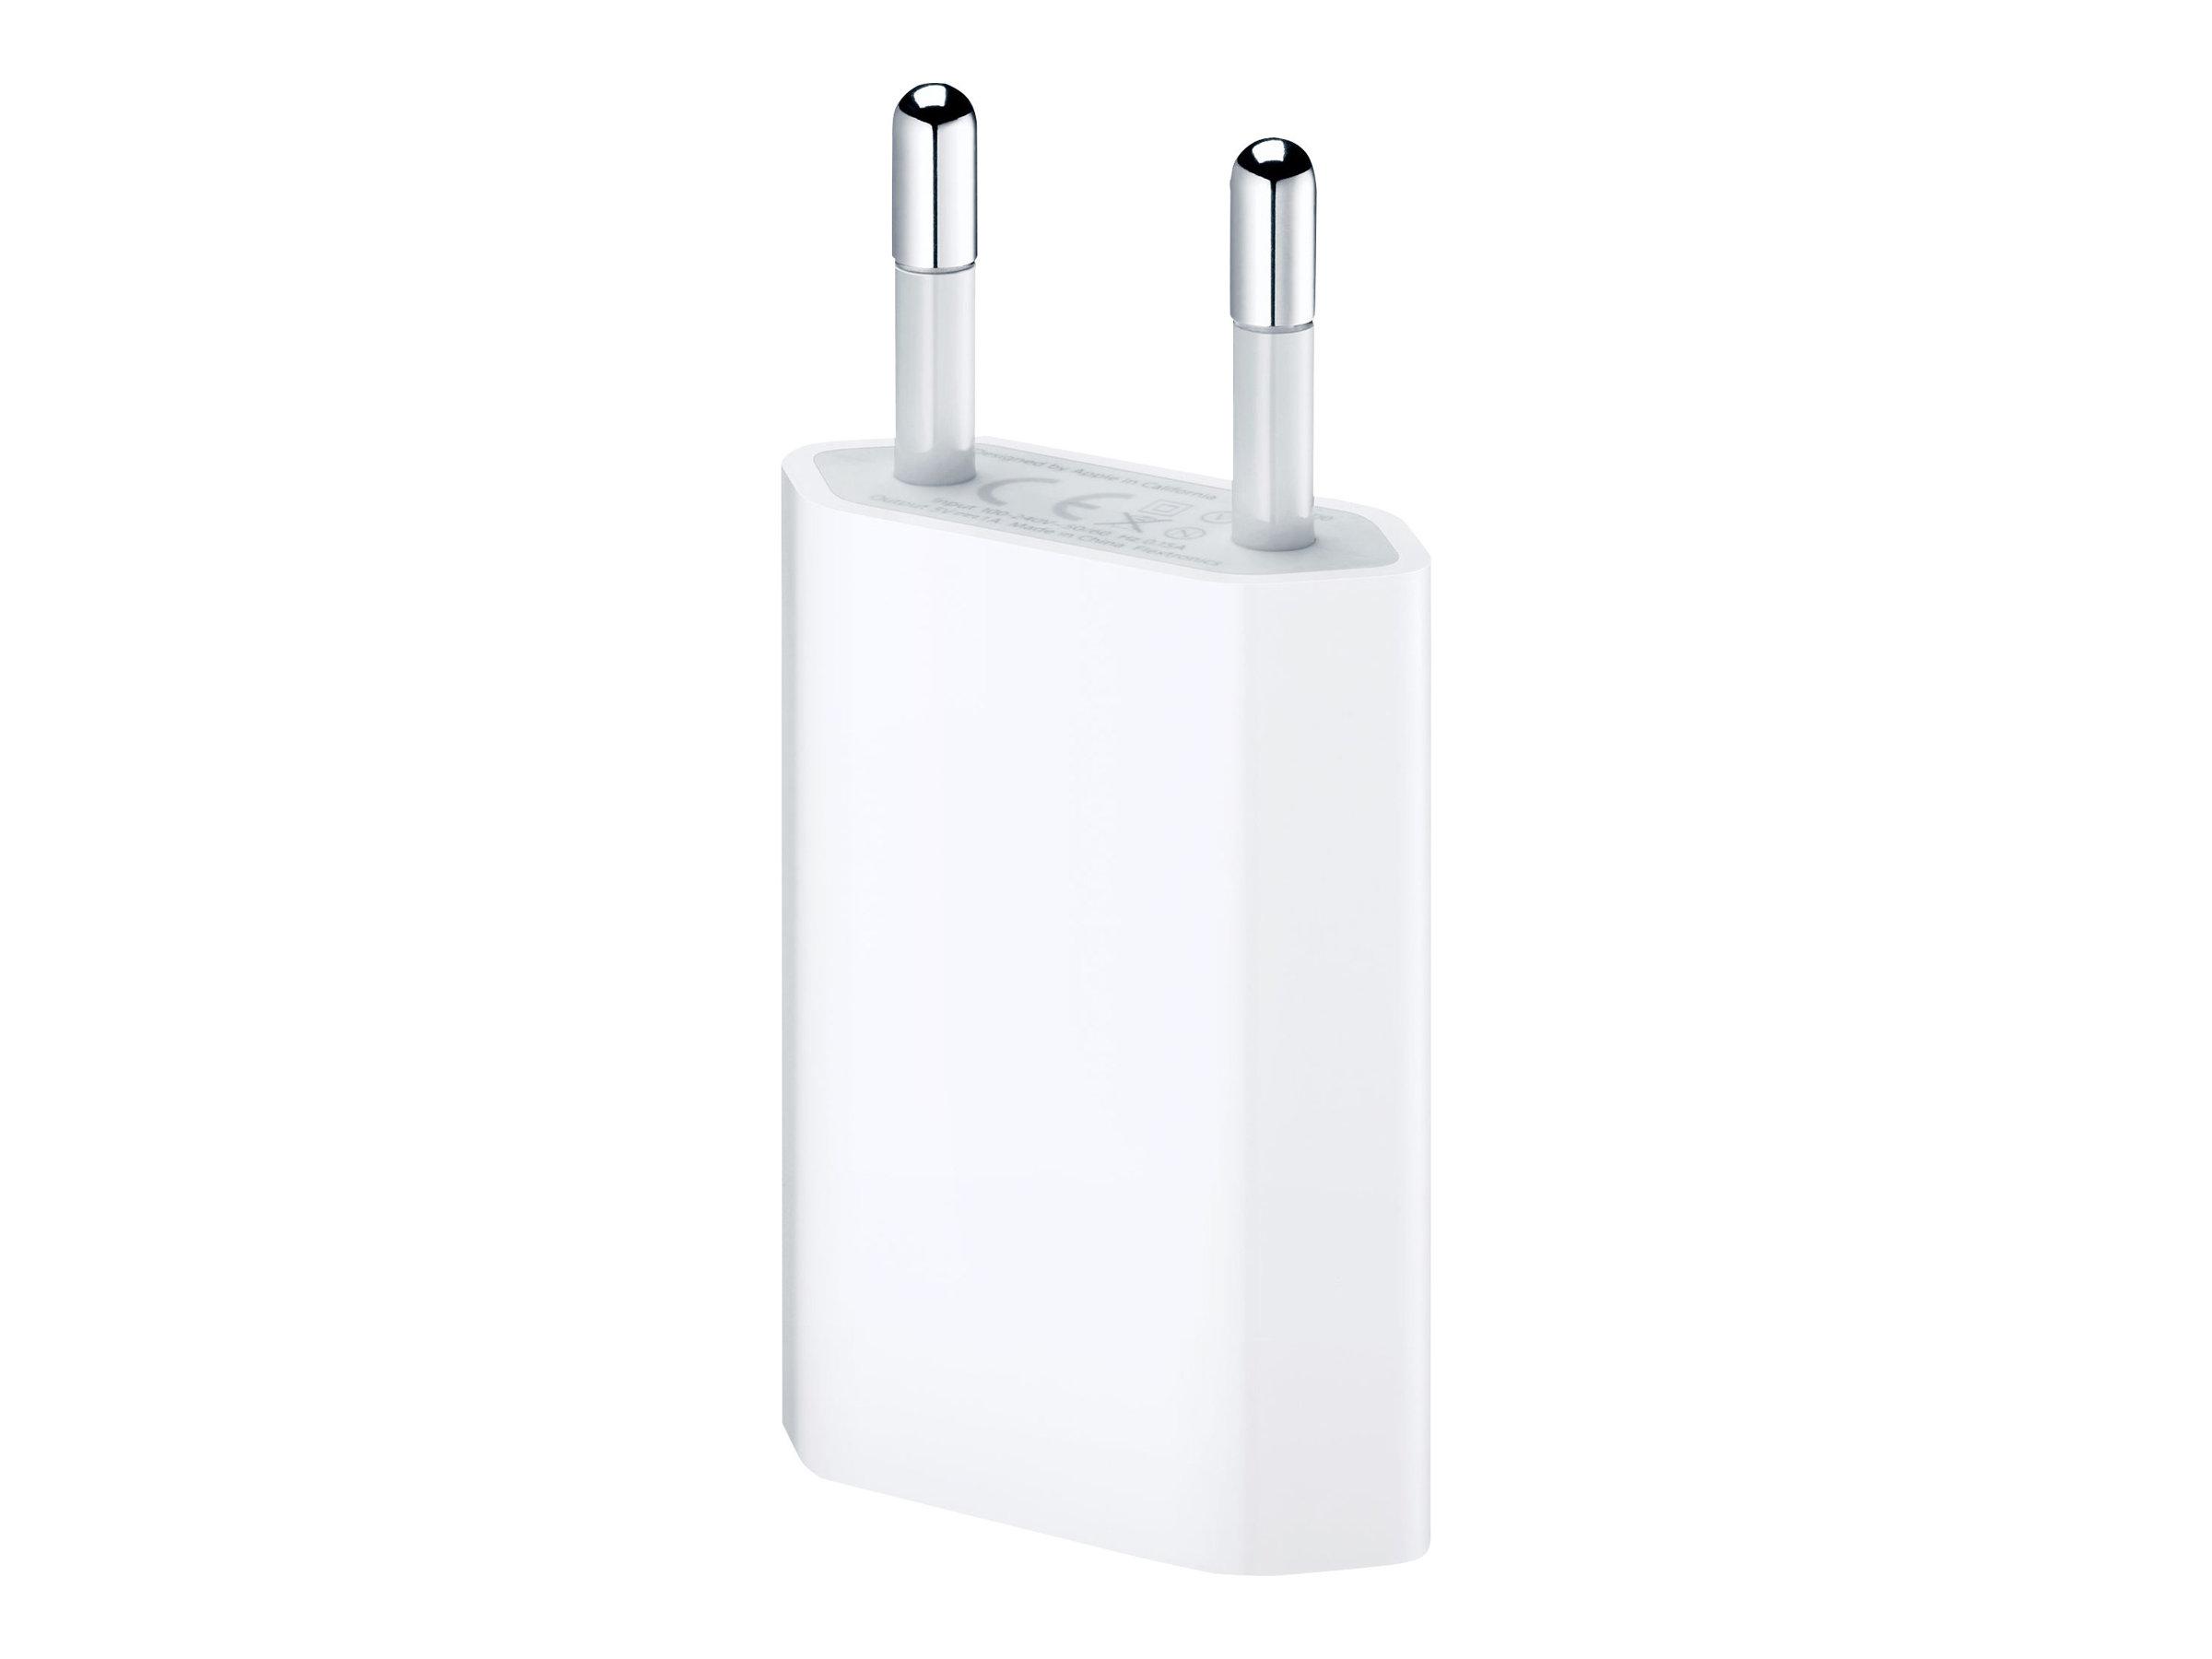 Apple 5W USB Power Adapter - Netzteil - 5 Watt (USB)